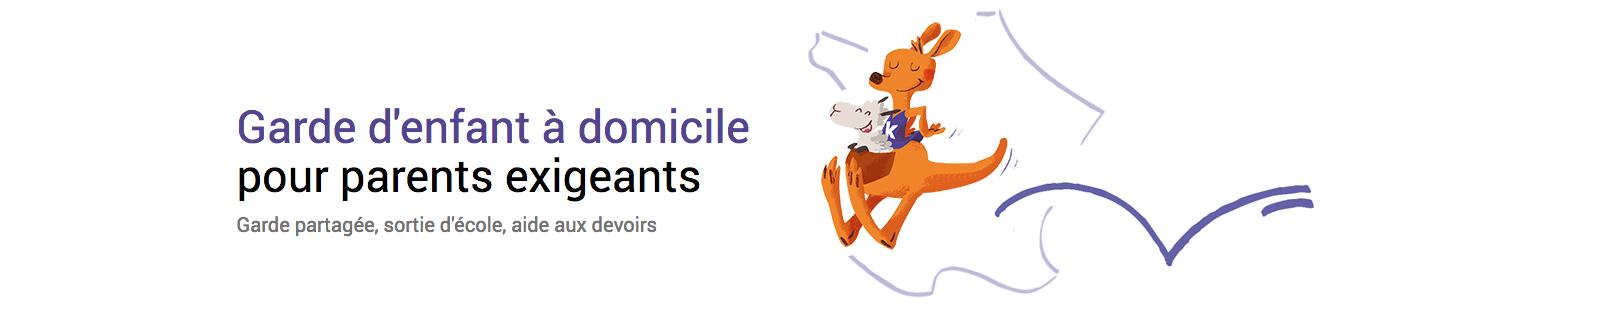 kangourou kids garde d'enfants